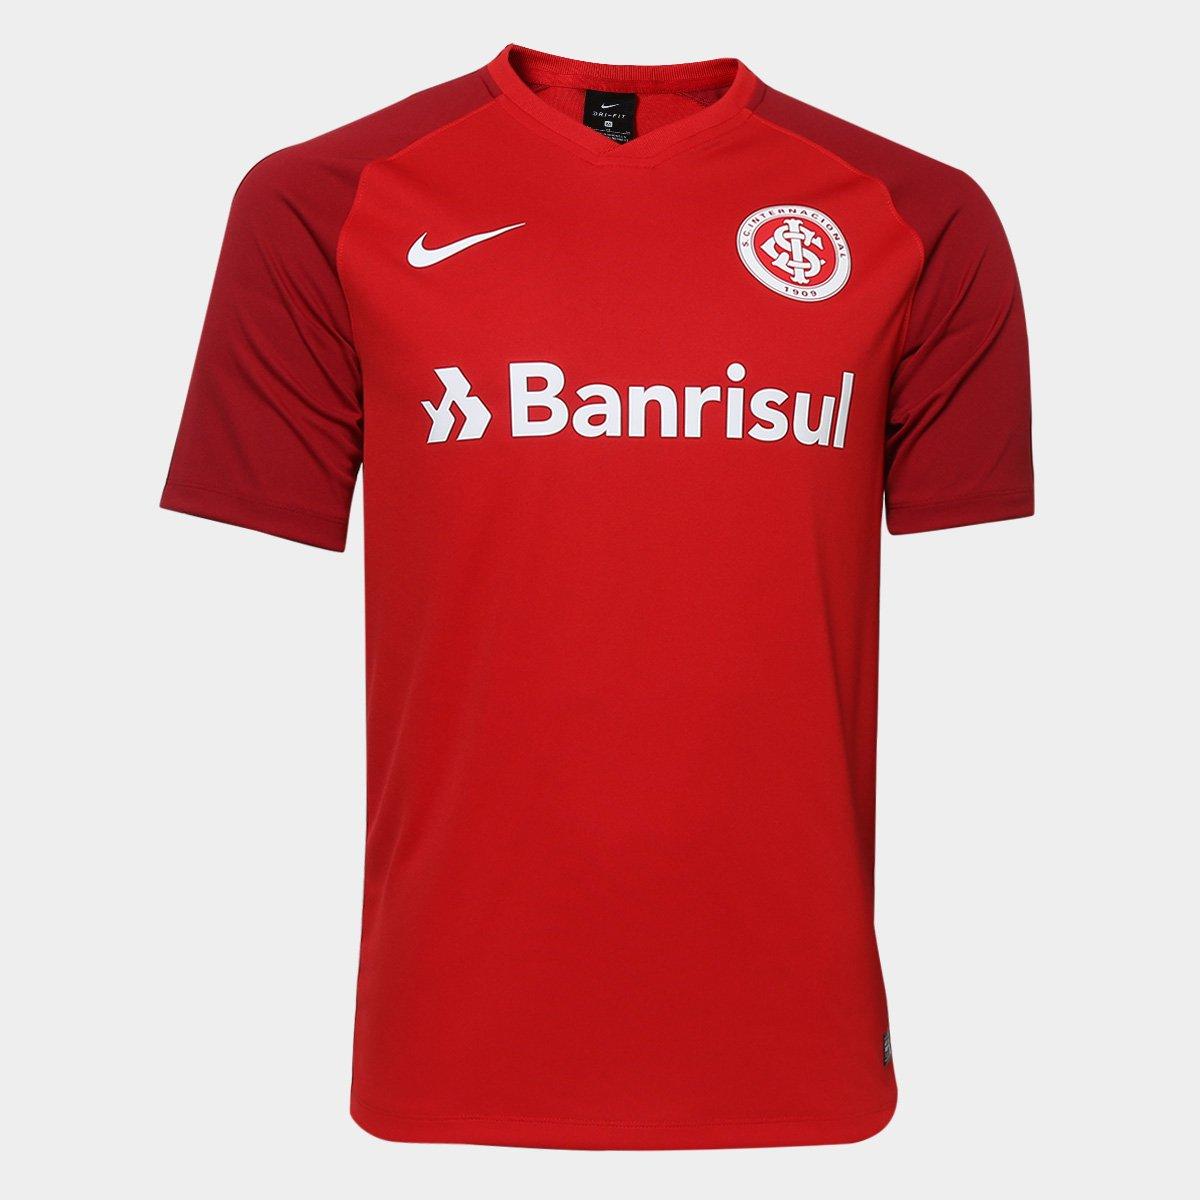 b72628b76b2 Camisa Internacional I 2018 s/n° - Torcedor Estádio Nike Masculina ...